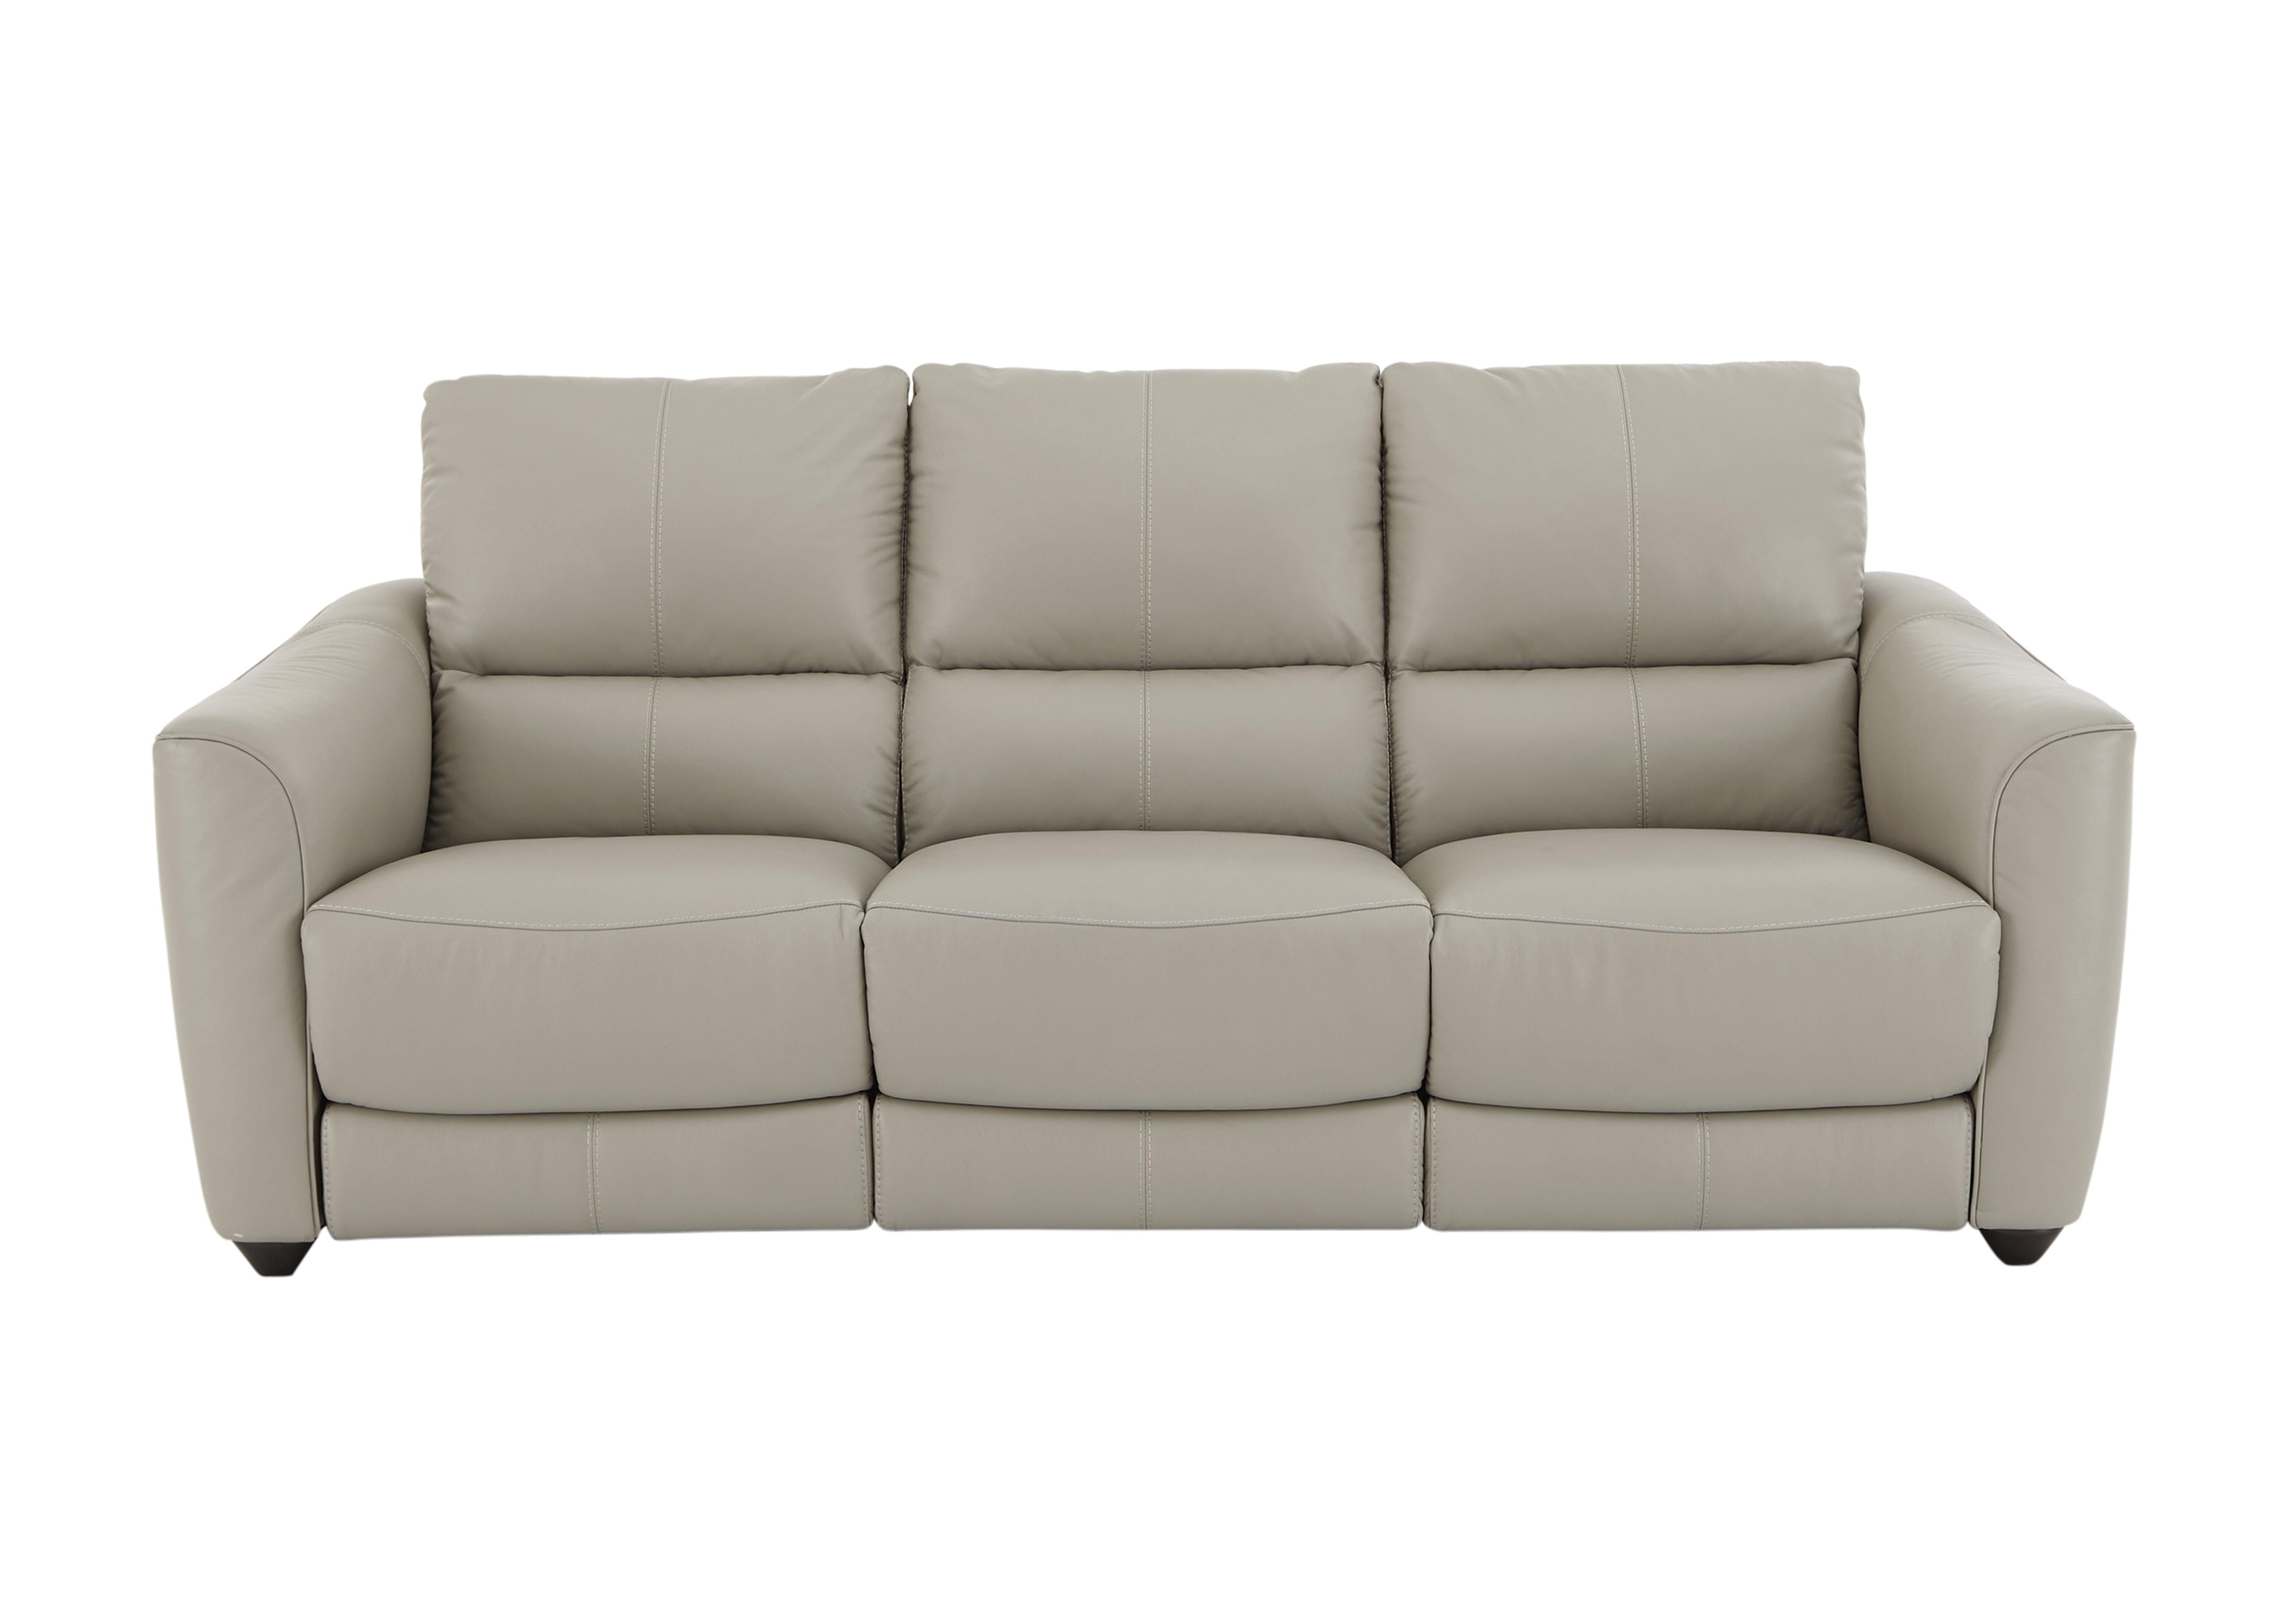 ... raleigh nc with Recliners sofa ...  sc 1 st  Modern House & Living Room Sets Raleigh Nc u2013 Modern House islam-shia.org